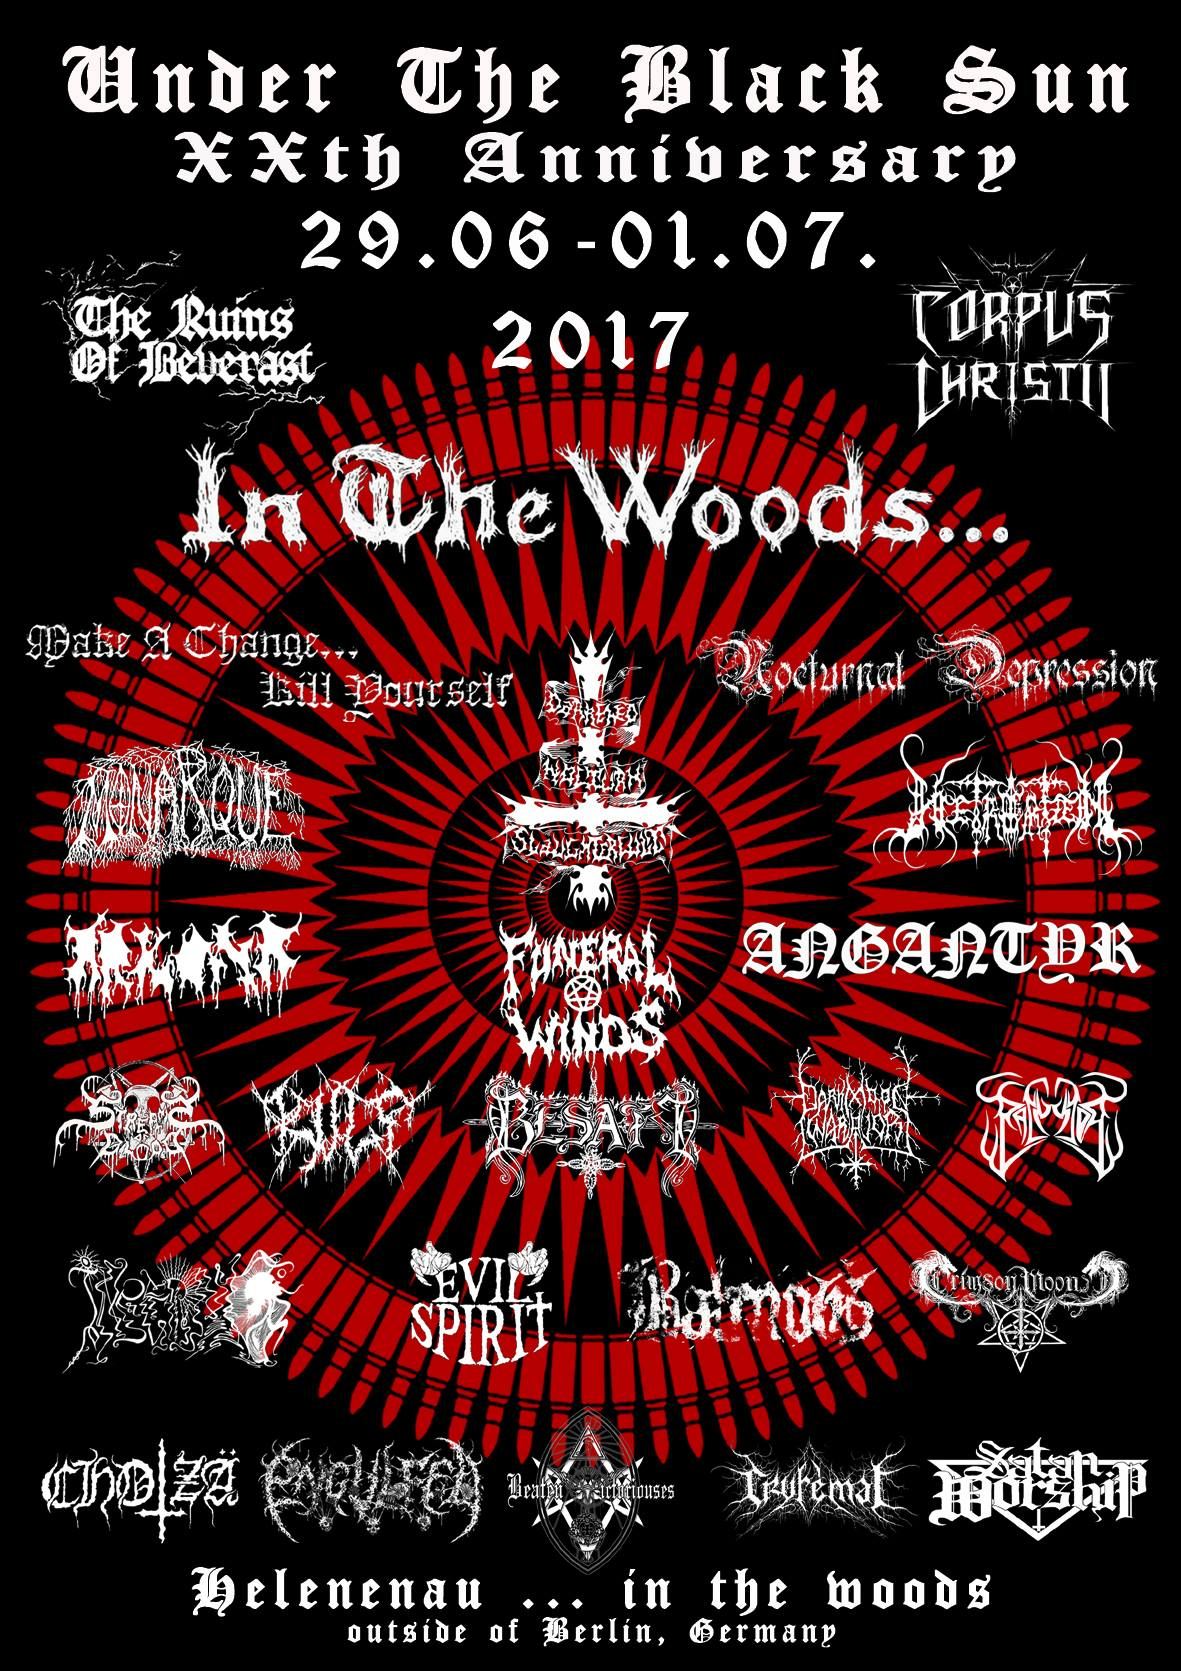 Under The Black Sun Festival 2017